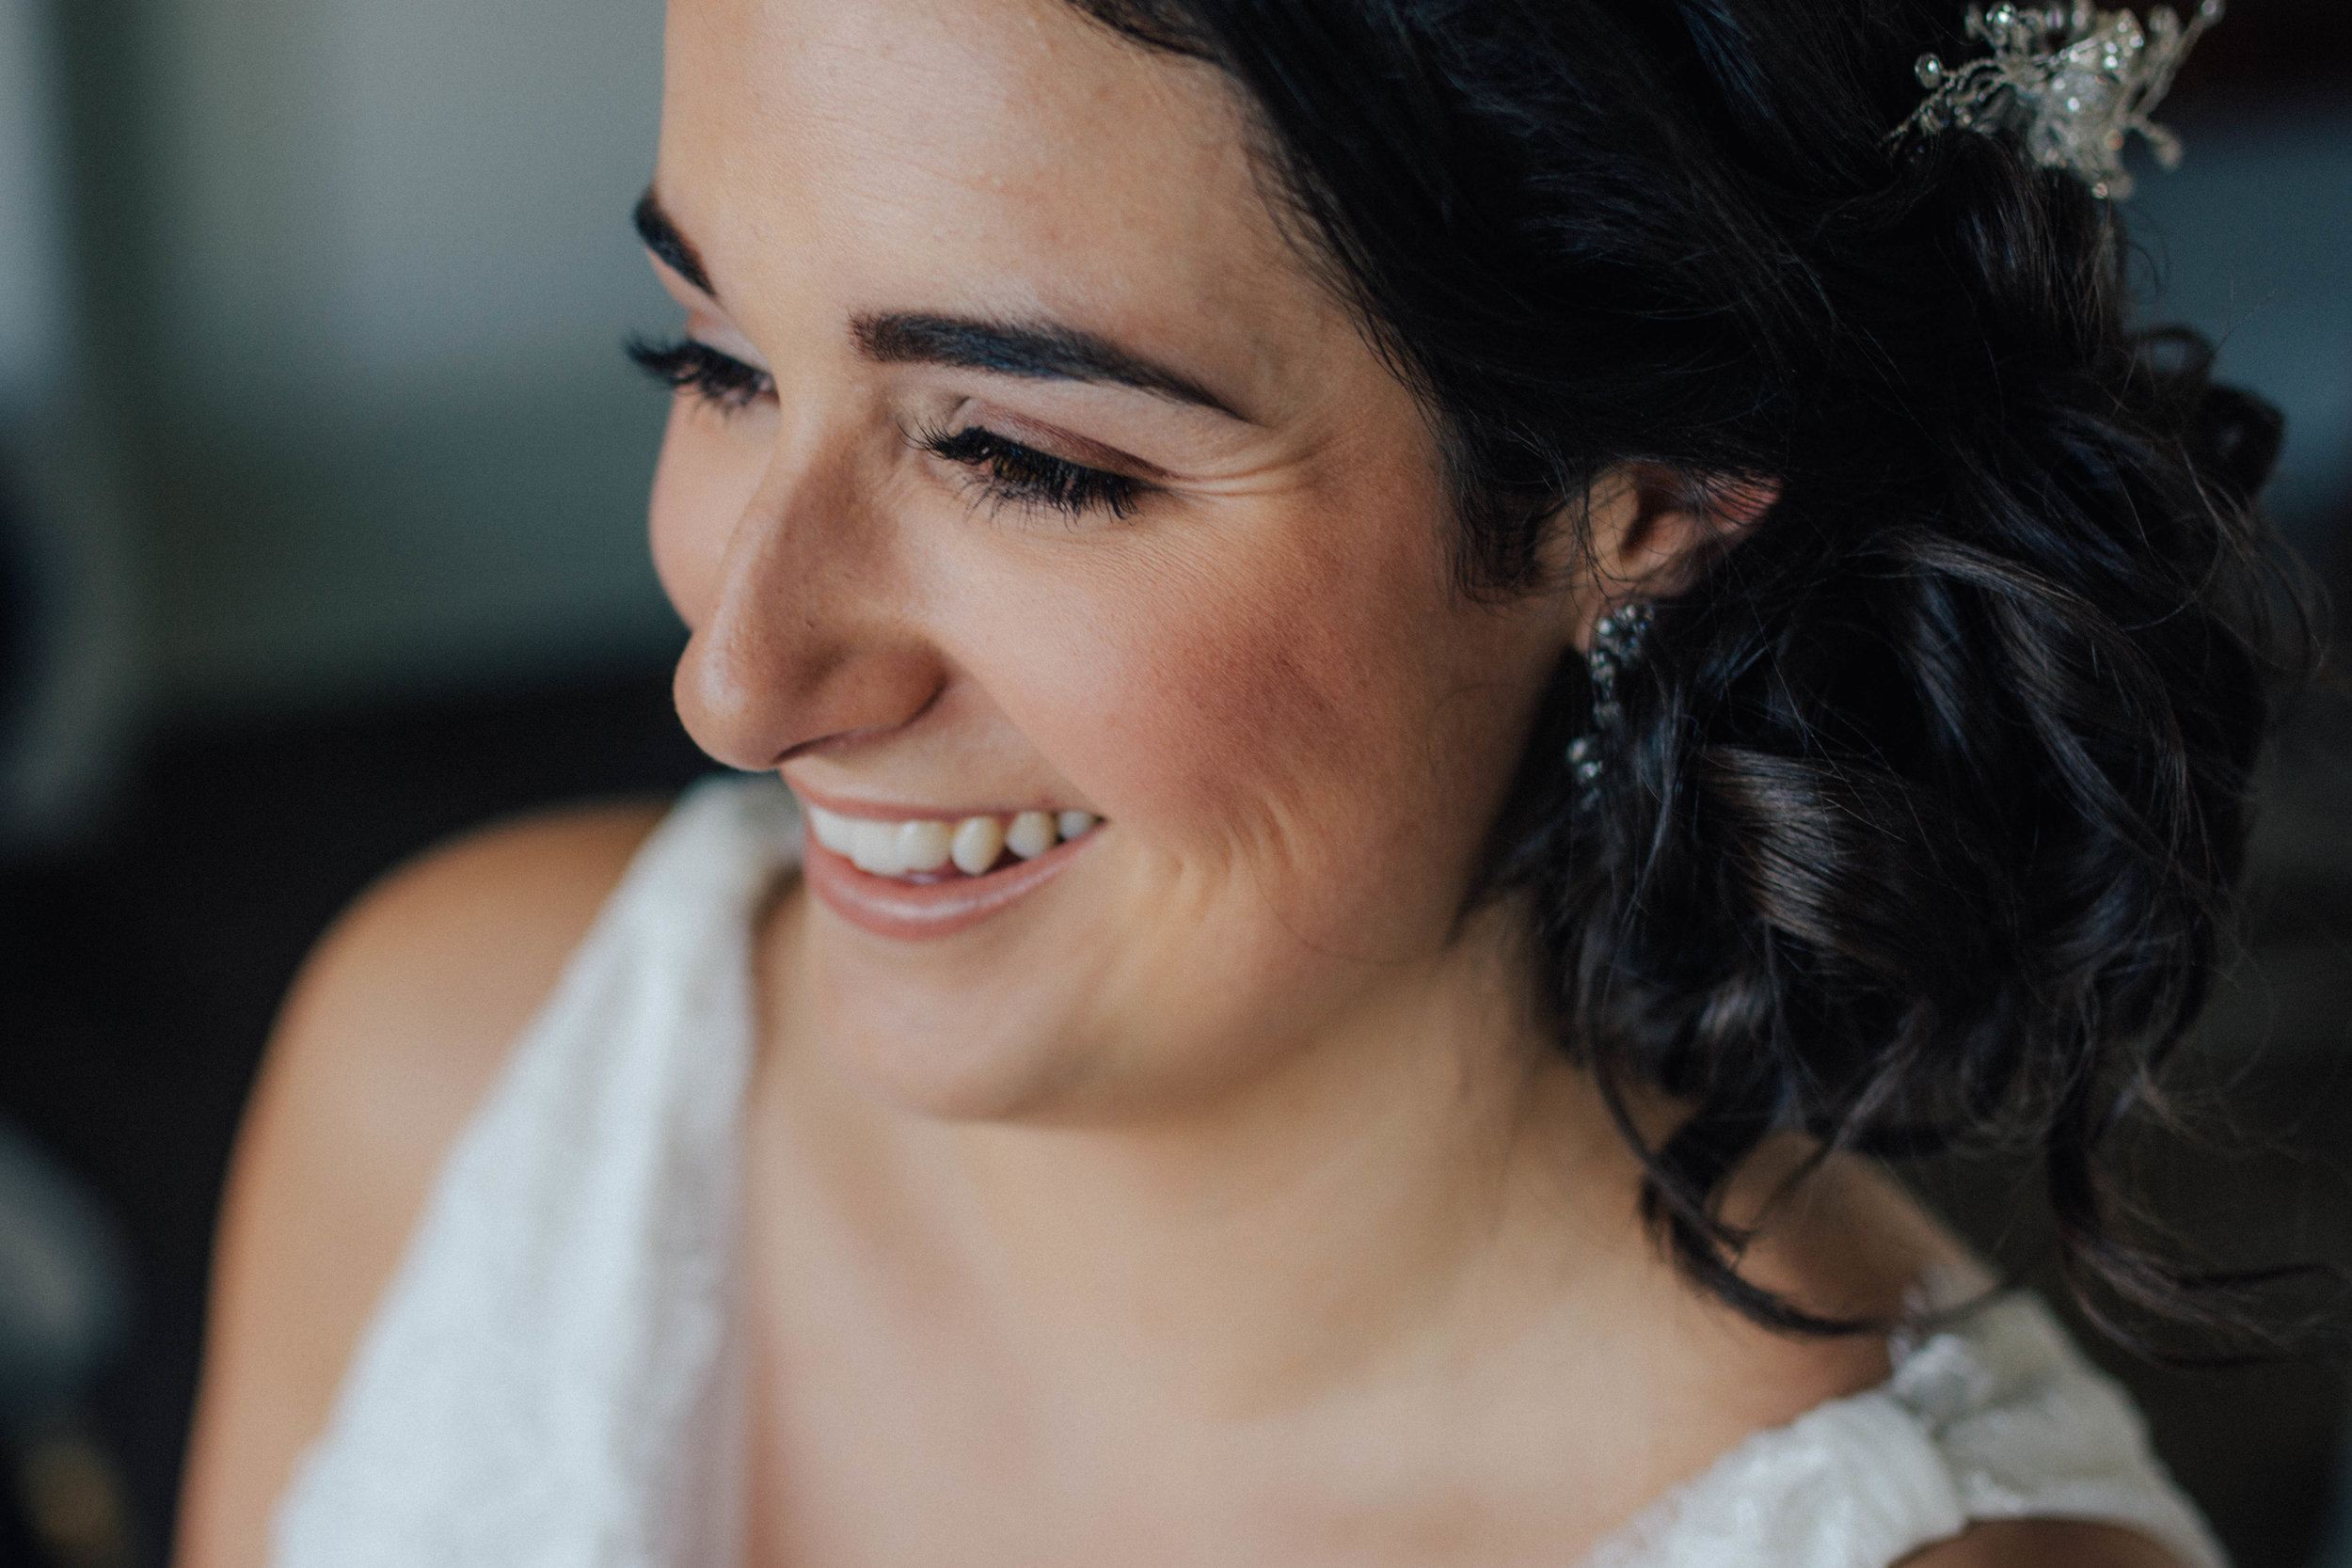 photographe_mariage_gatineau_hull_outaouais_photographer_ottawa_wedding_hilton-2.jpg